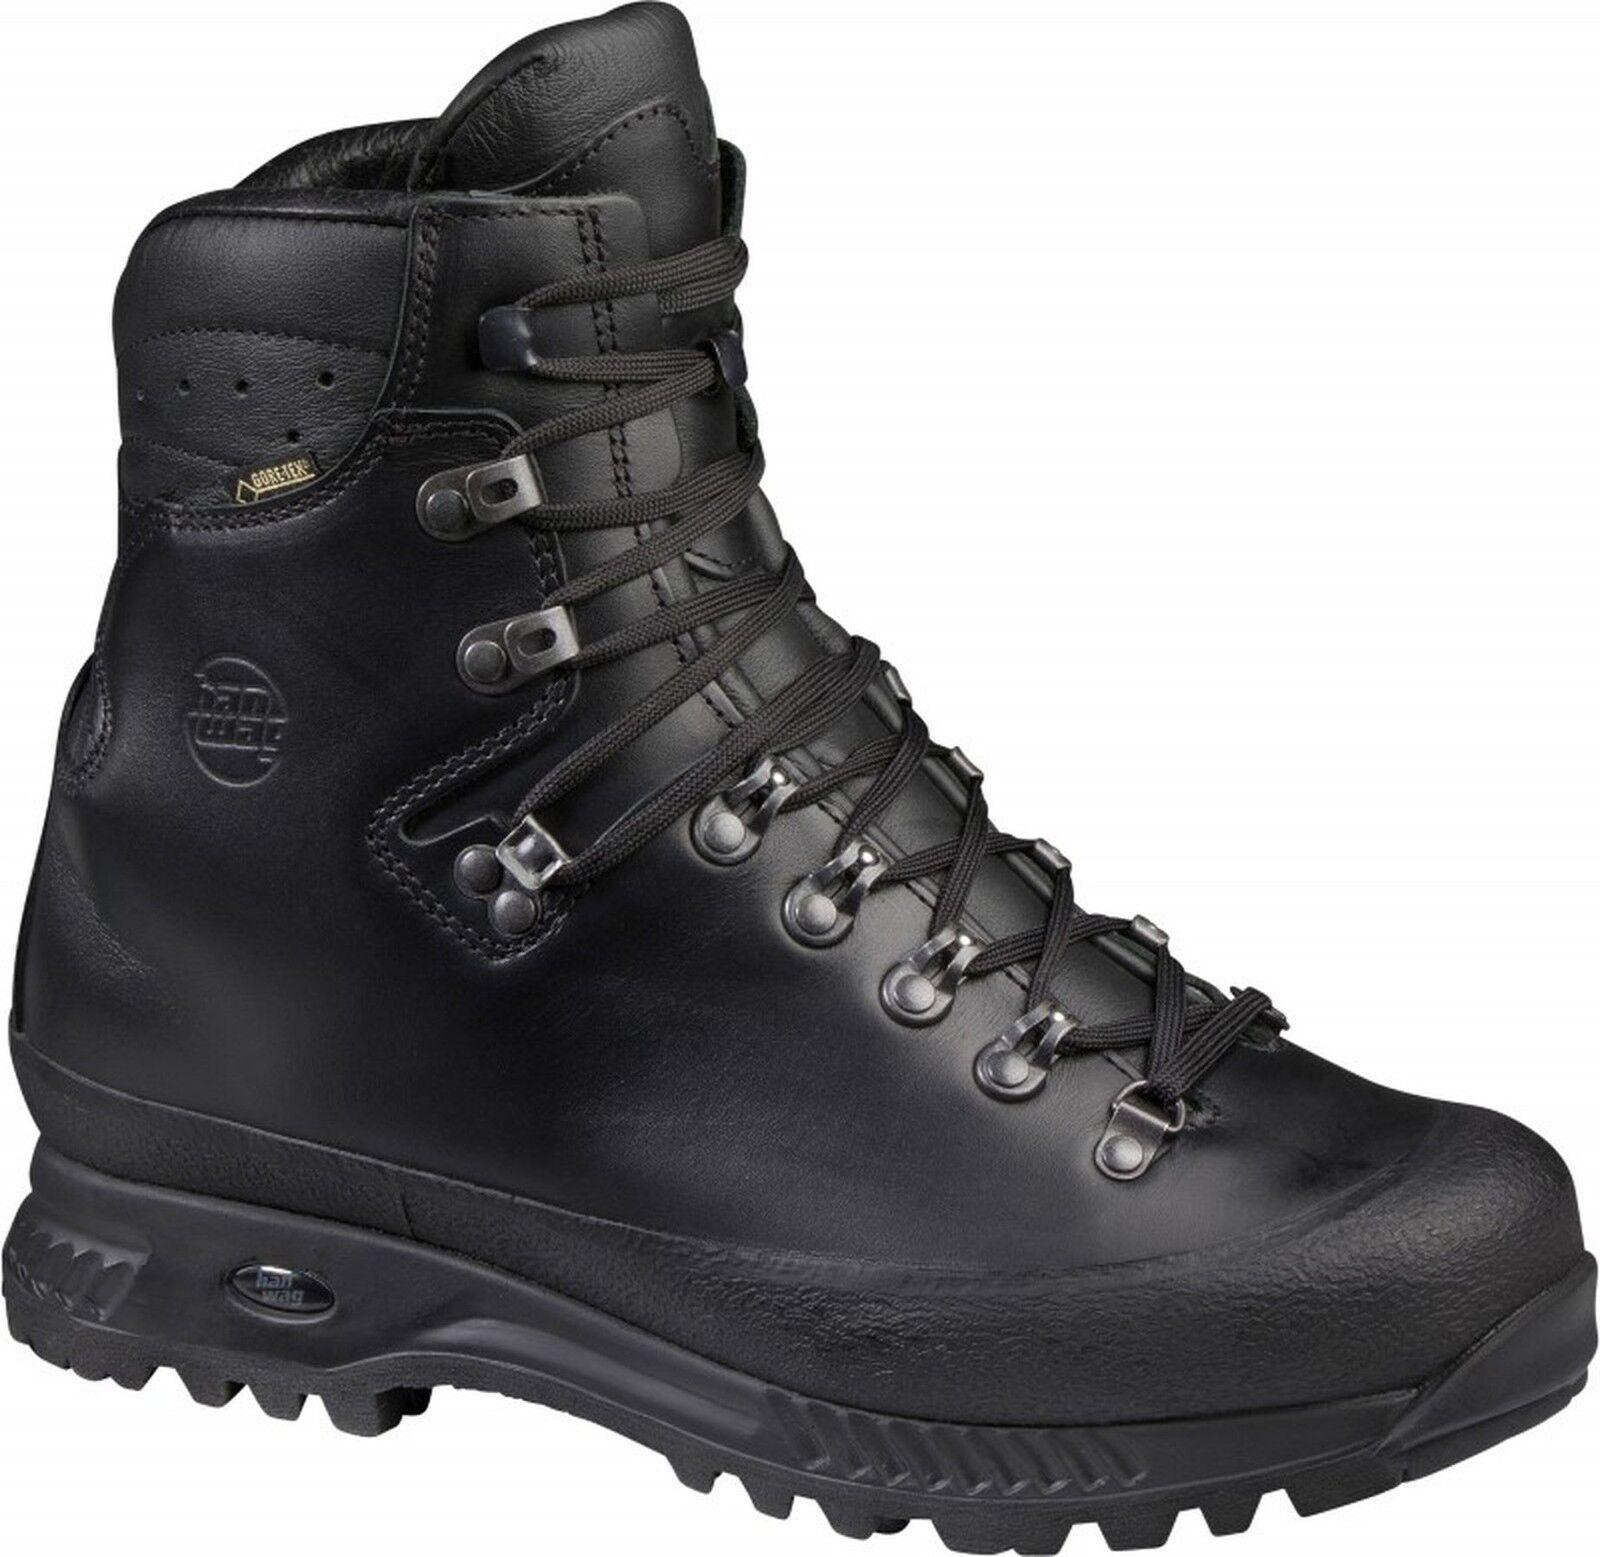 Hanwag GTX Bergschuhe:Alaska WIDE GTX Hanwag Men Größe 14 - 50 schwarz 548371